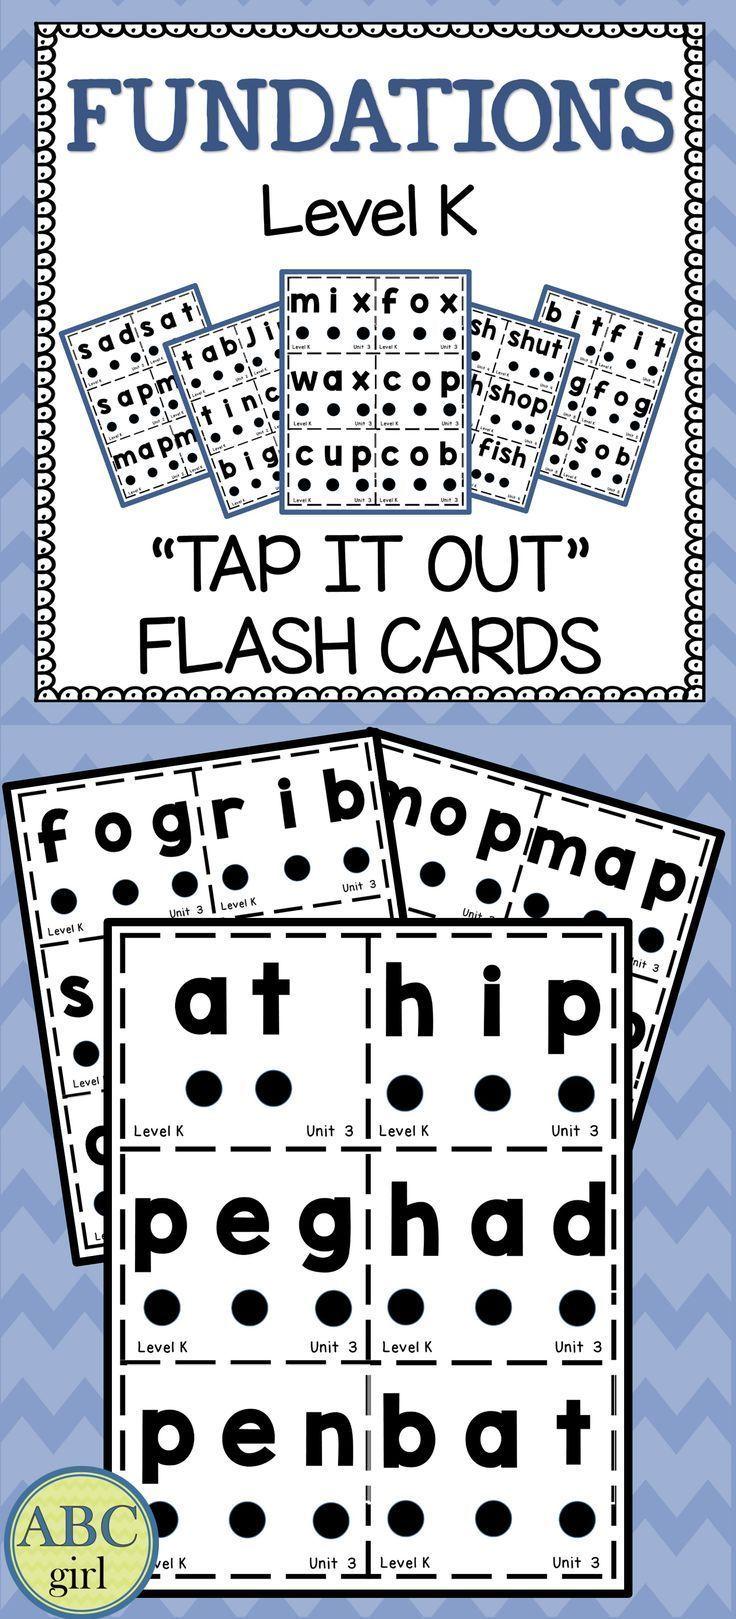 worksheet Wilson Reading Worksheets kindergarten fundations level k tap it out flash cards wilson readingearly